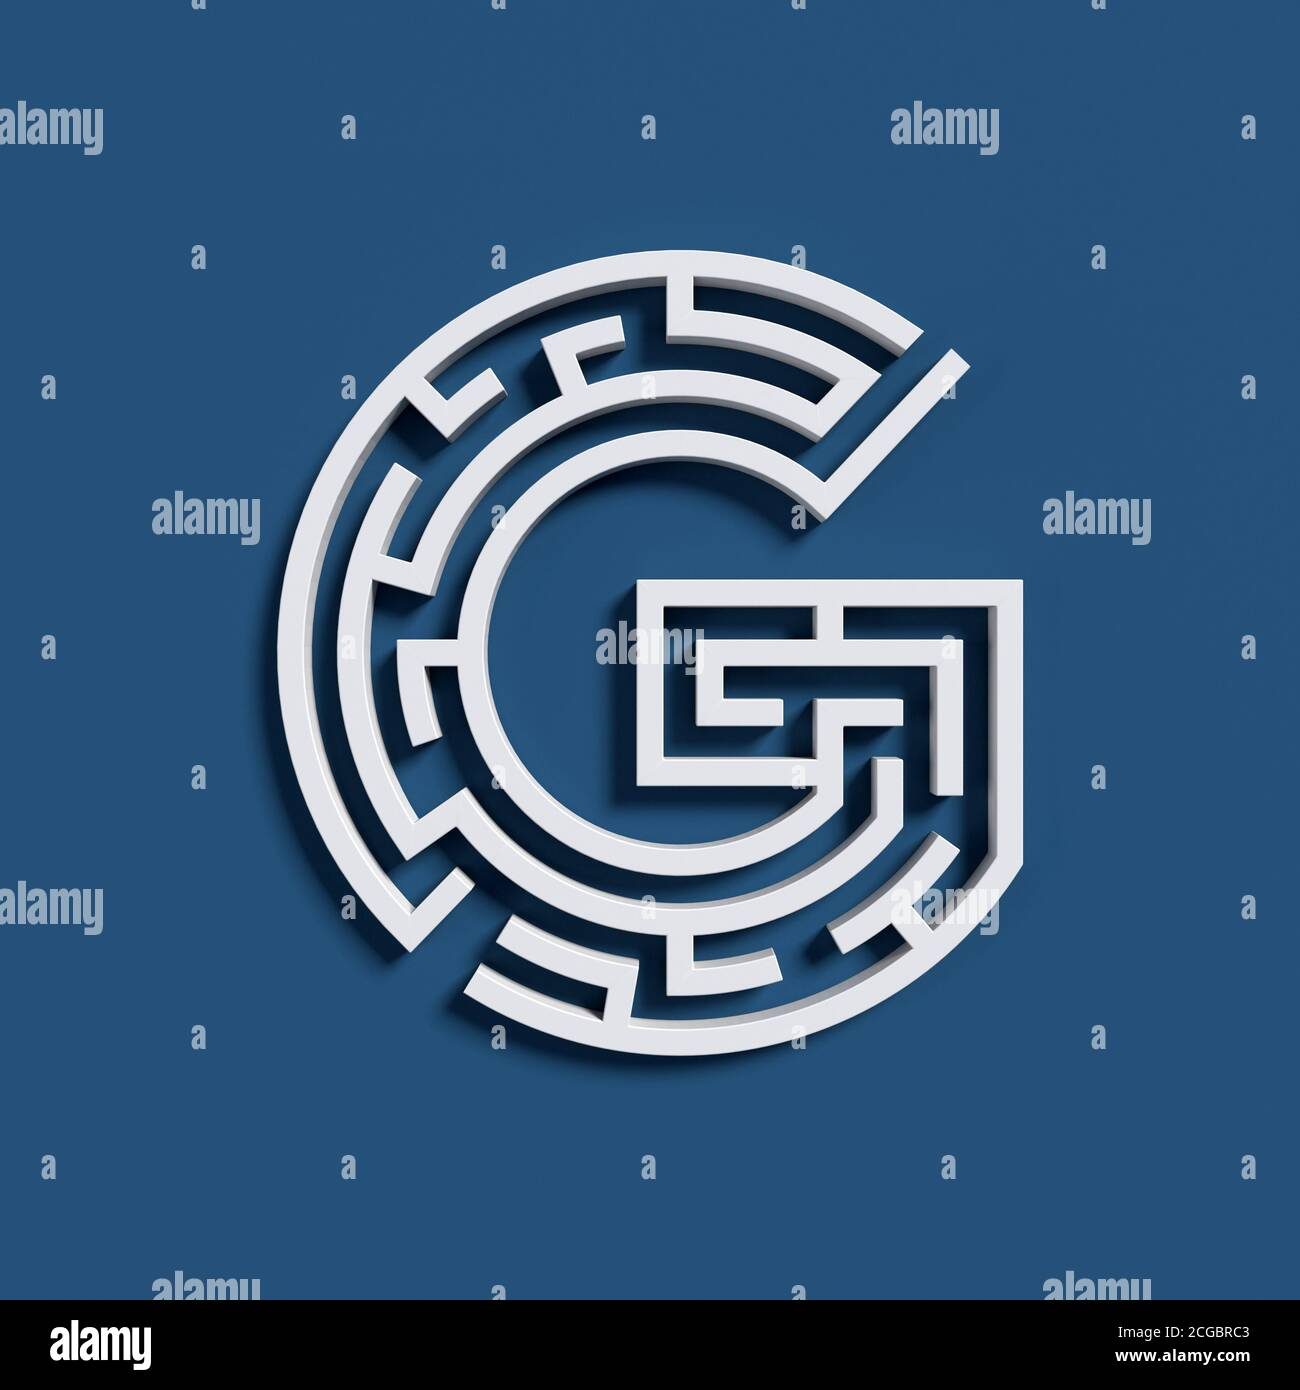 Maze Font Letter G Stock Photo Alamy